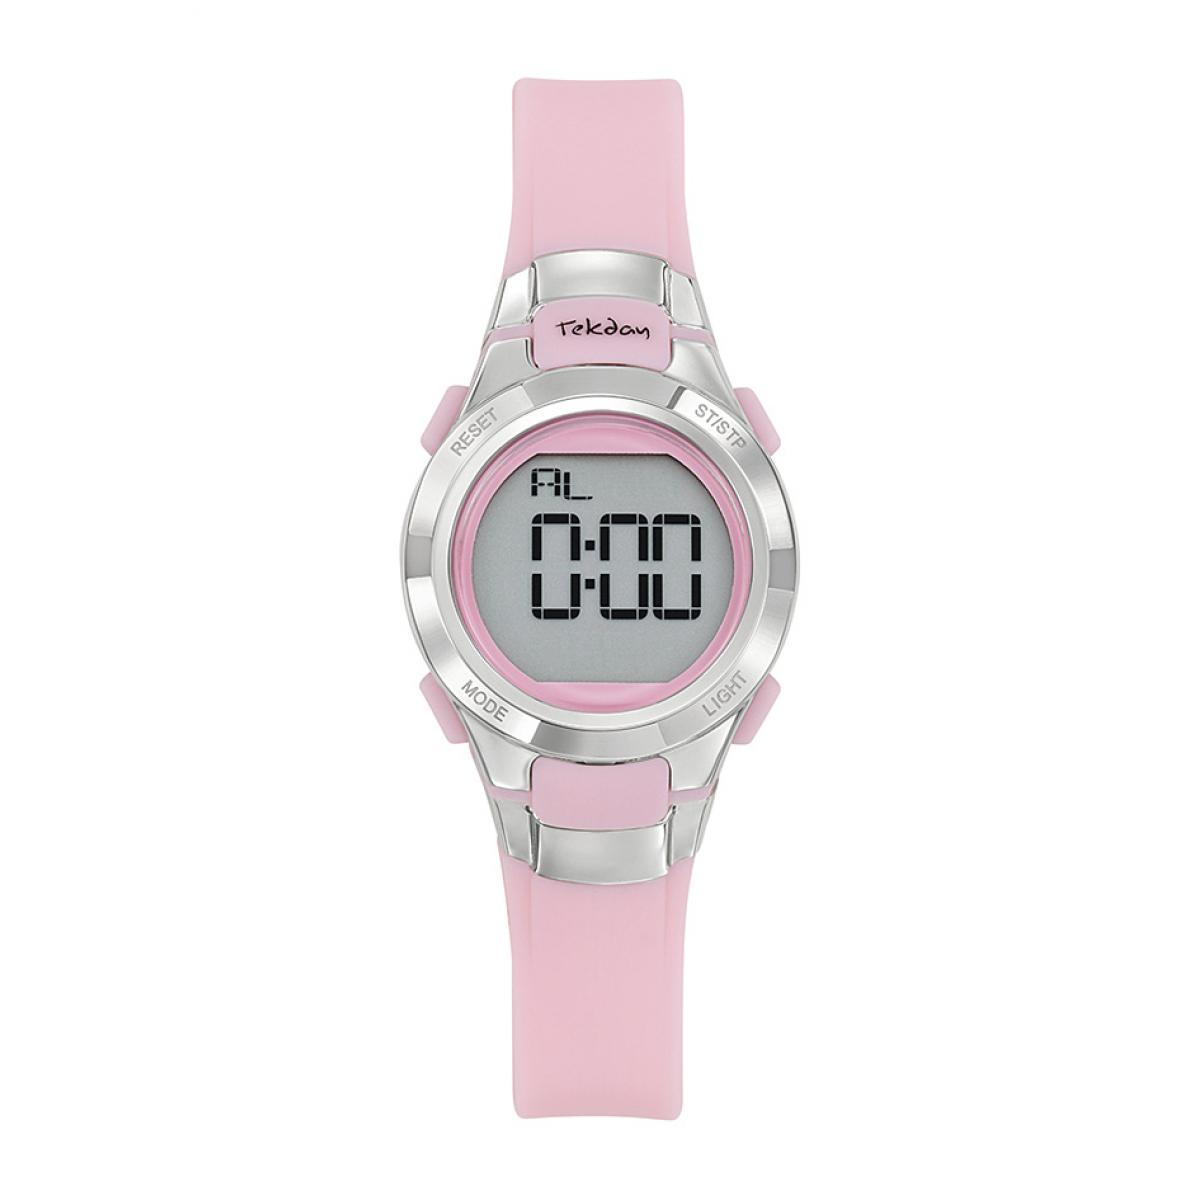 Montre 654667 - Bracelet Silicone Rose Boitier Silicone Rose - Tekday - Modalova